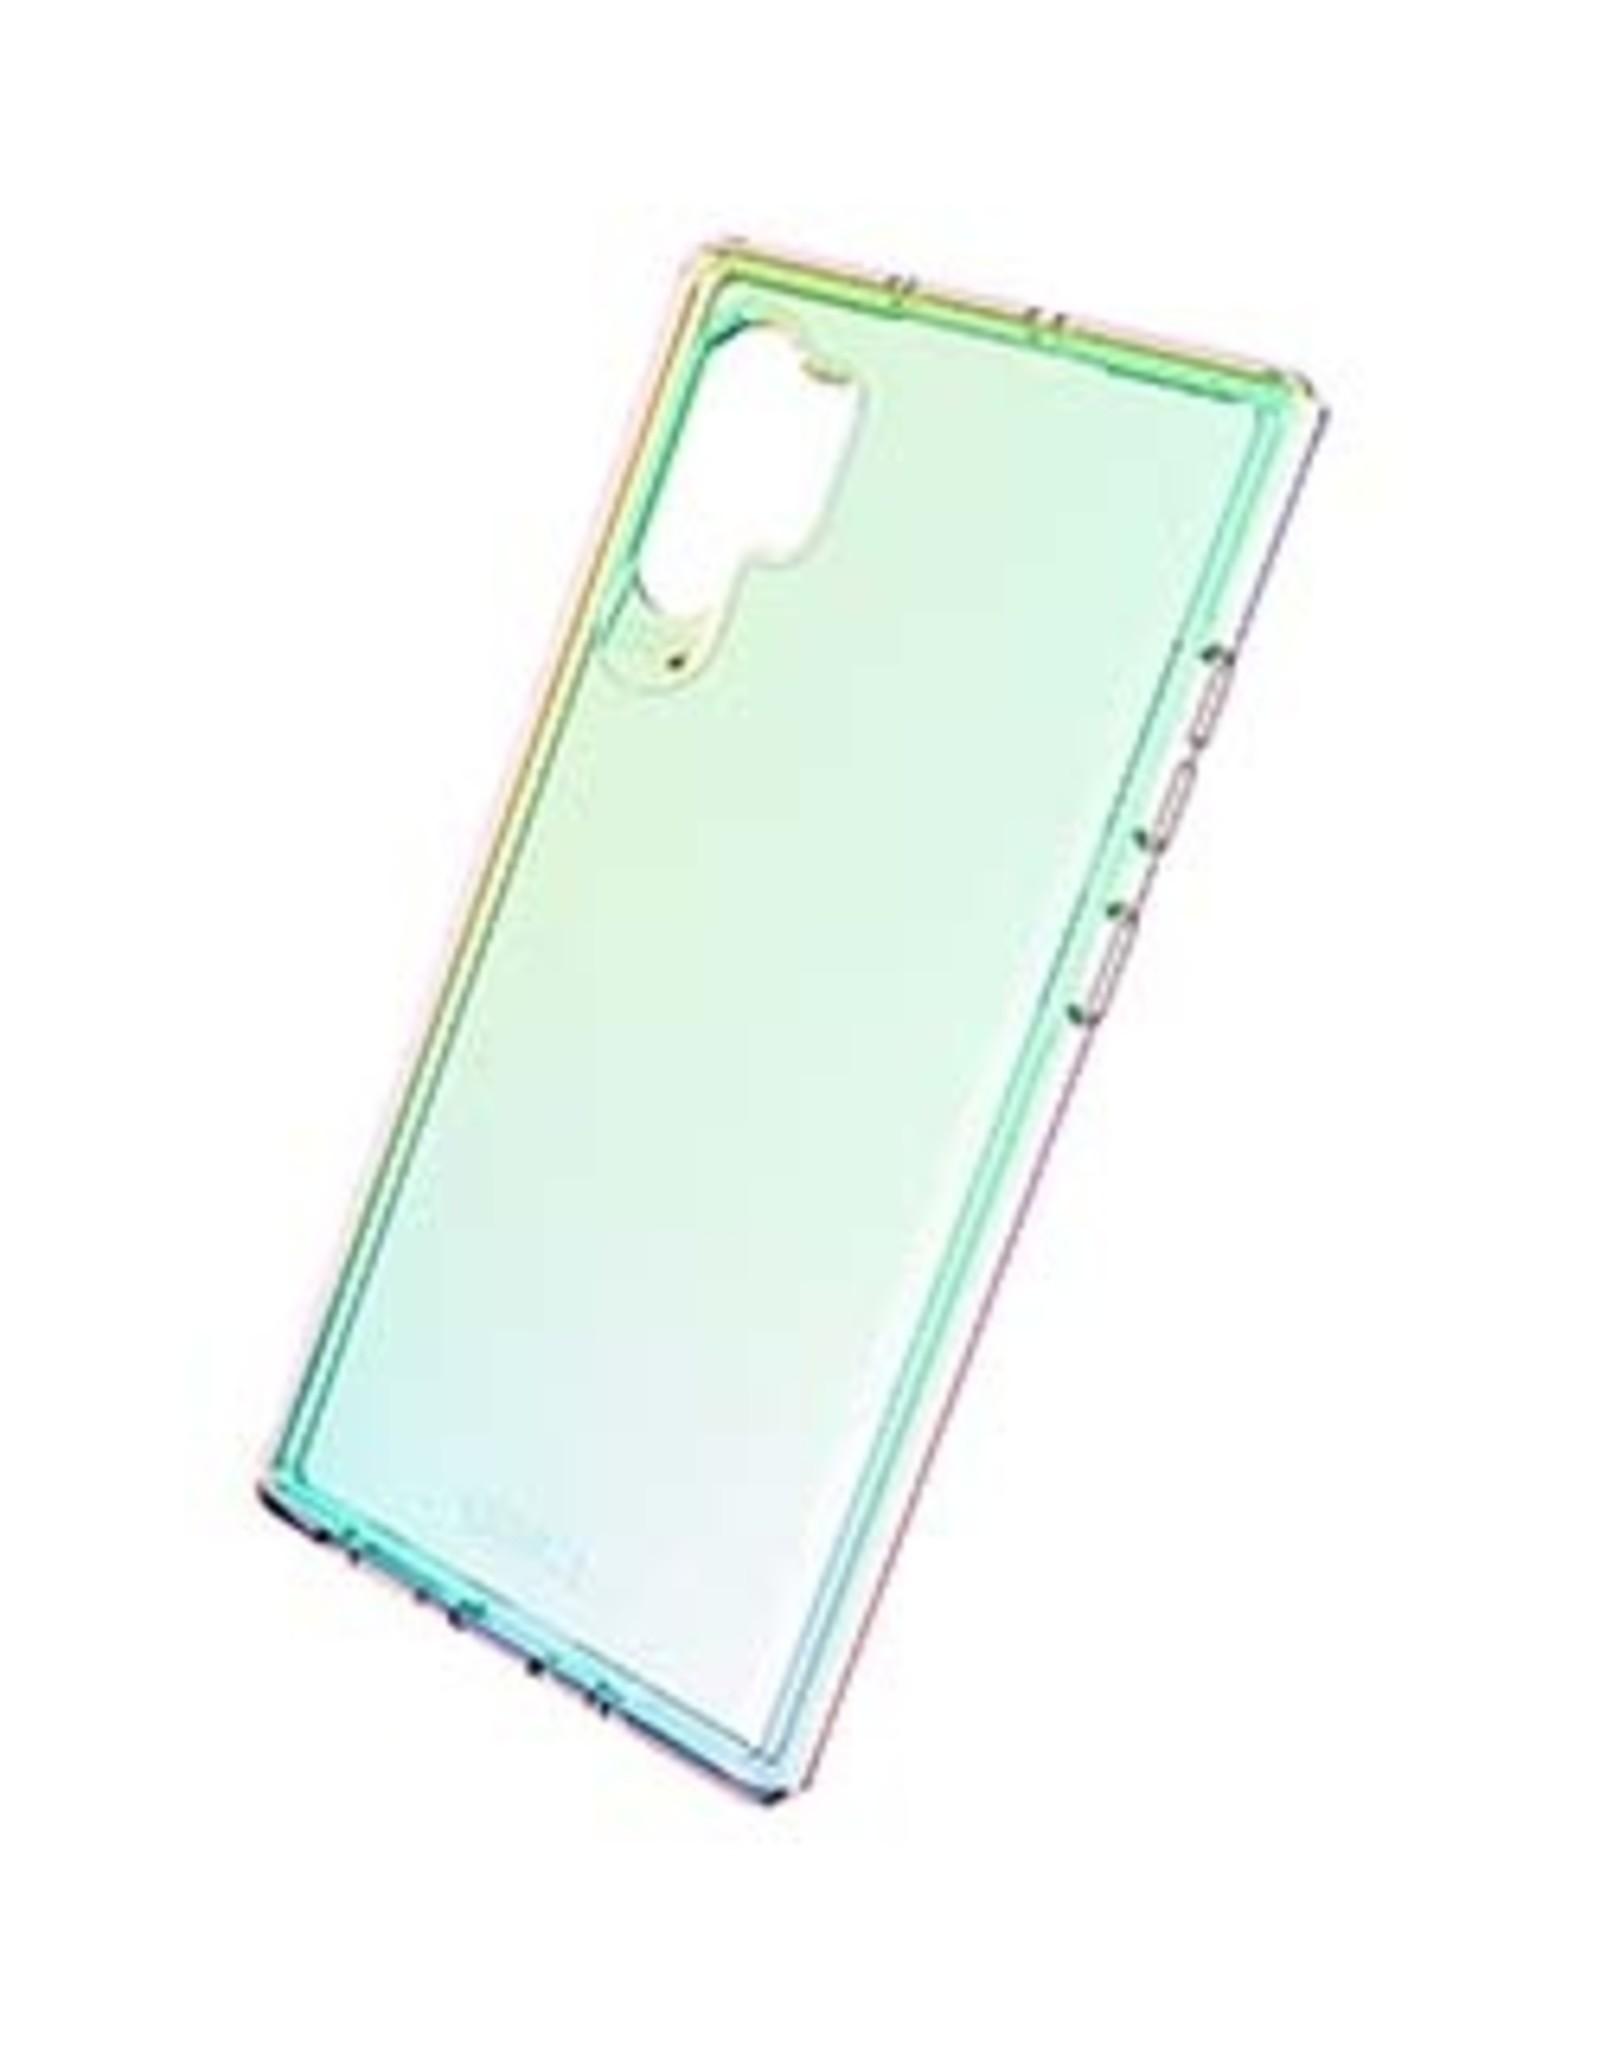 GEAR4 GEAR4 | Samsung Galaxy Note 10+  D3O Iridescent Crystal Palace Case 15-04836